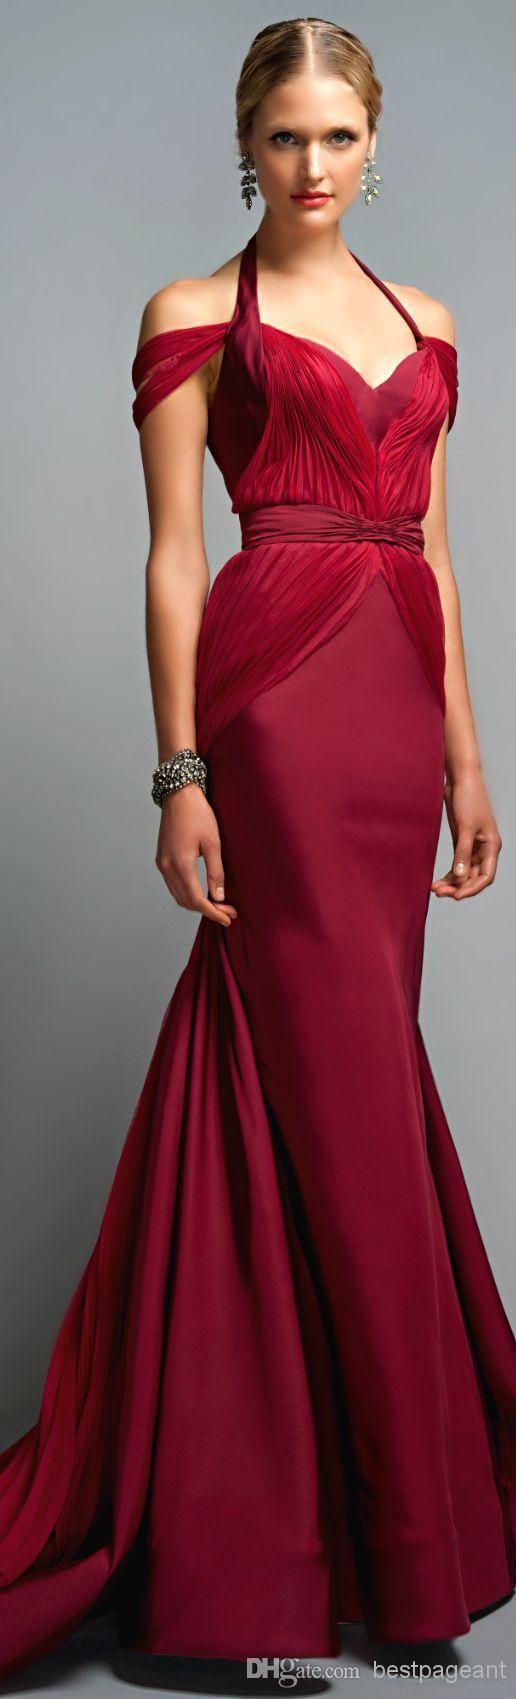 Top prom dresses zac fashion pinterest prom